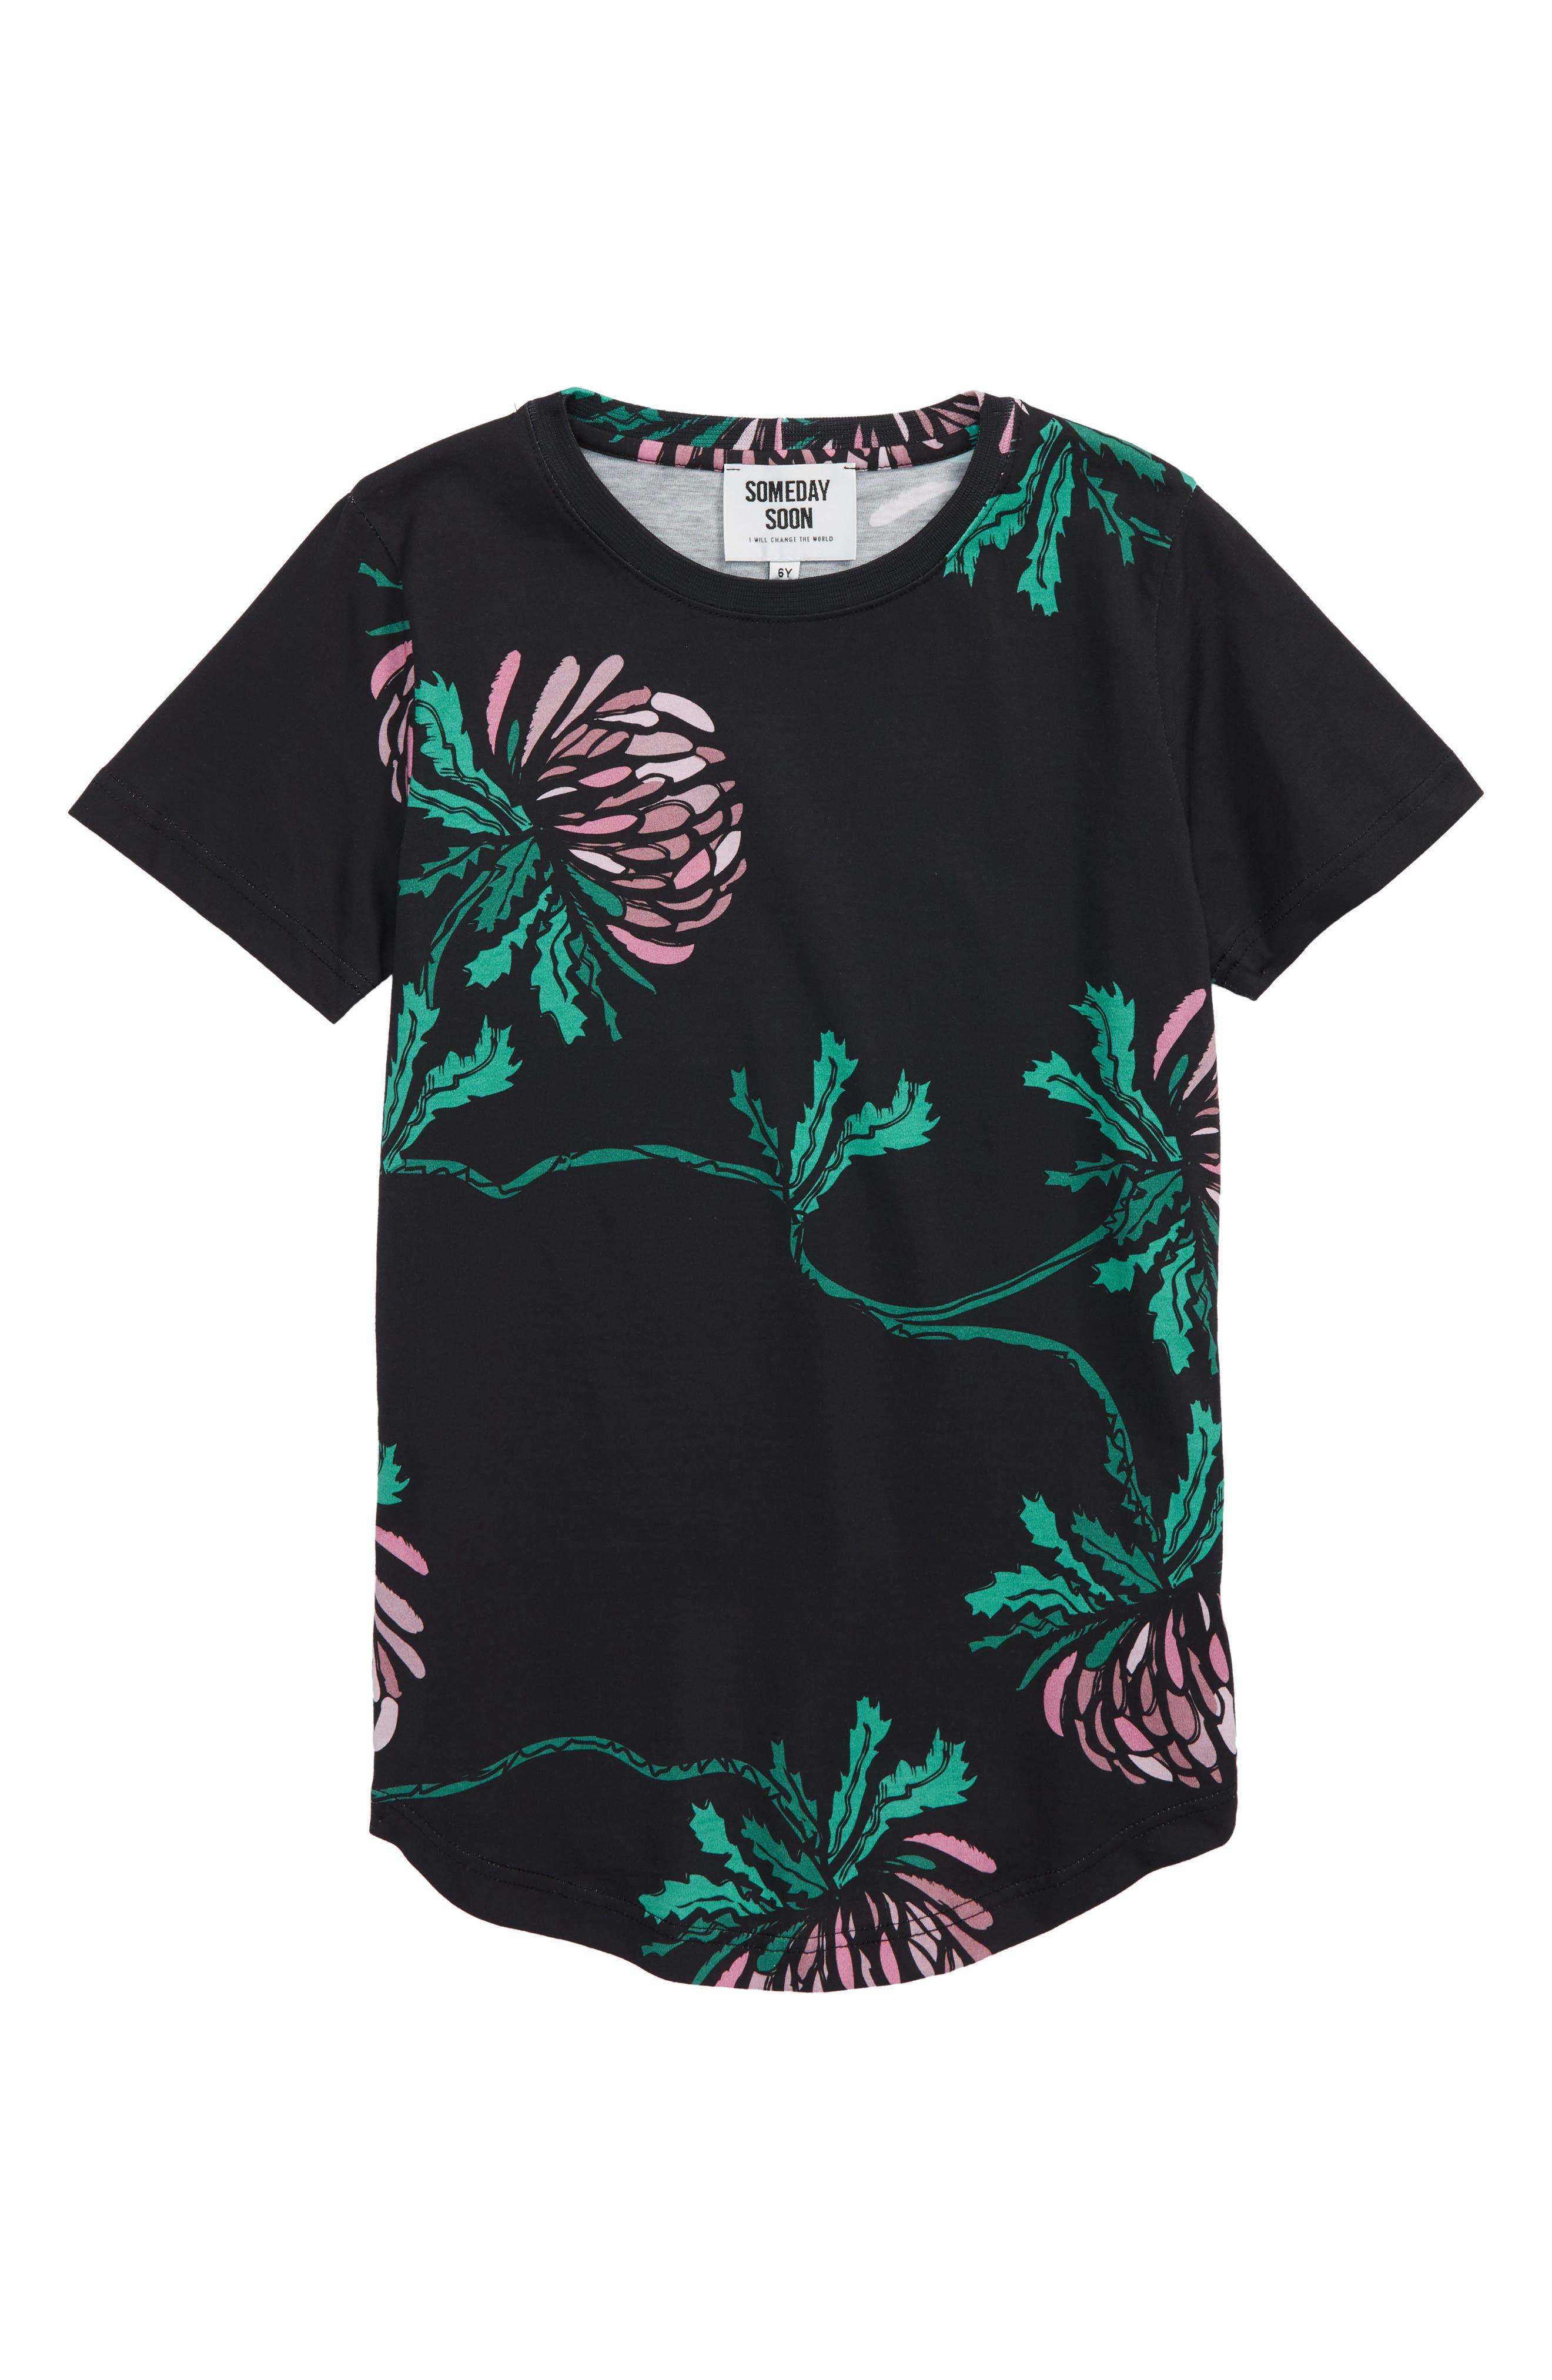 Louis T-Shirt,                             Main thumbnail 1, color,                             Black